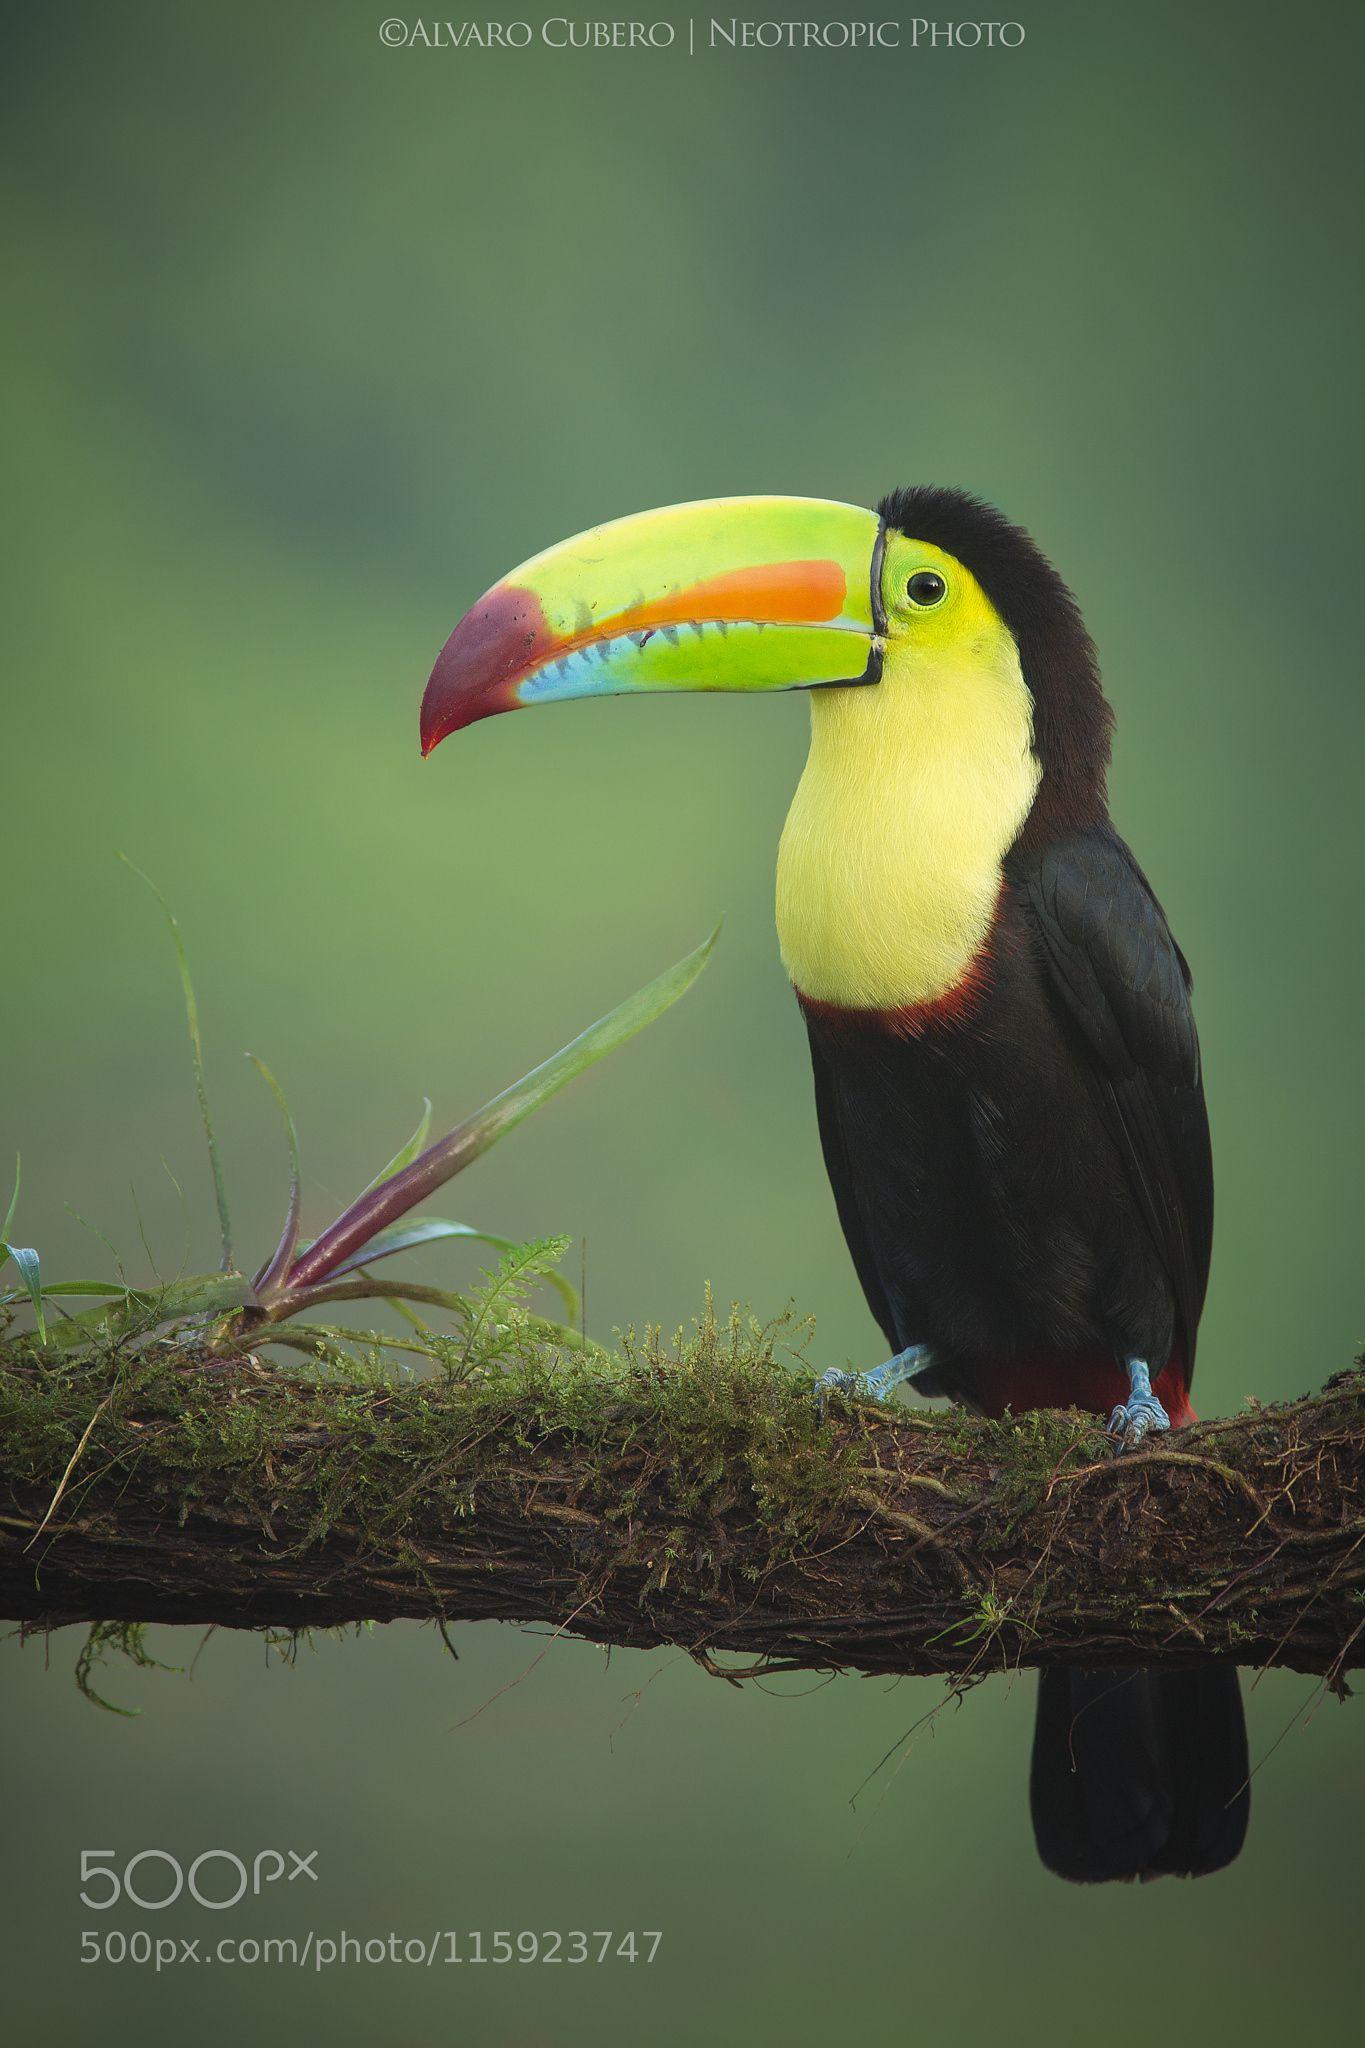 The Toucan Multicolor By Alvaro Cubero Vega Beautiful Birds Rainforest Animals Tropical Birds